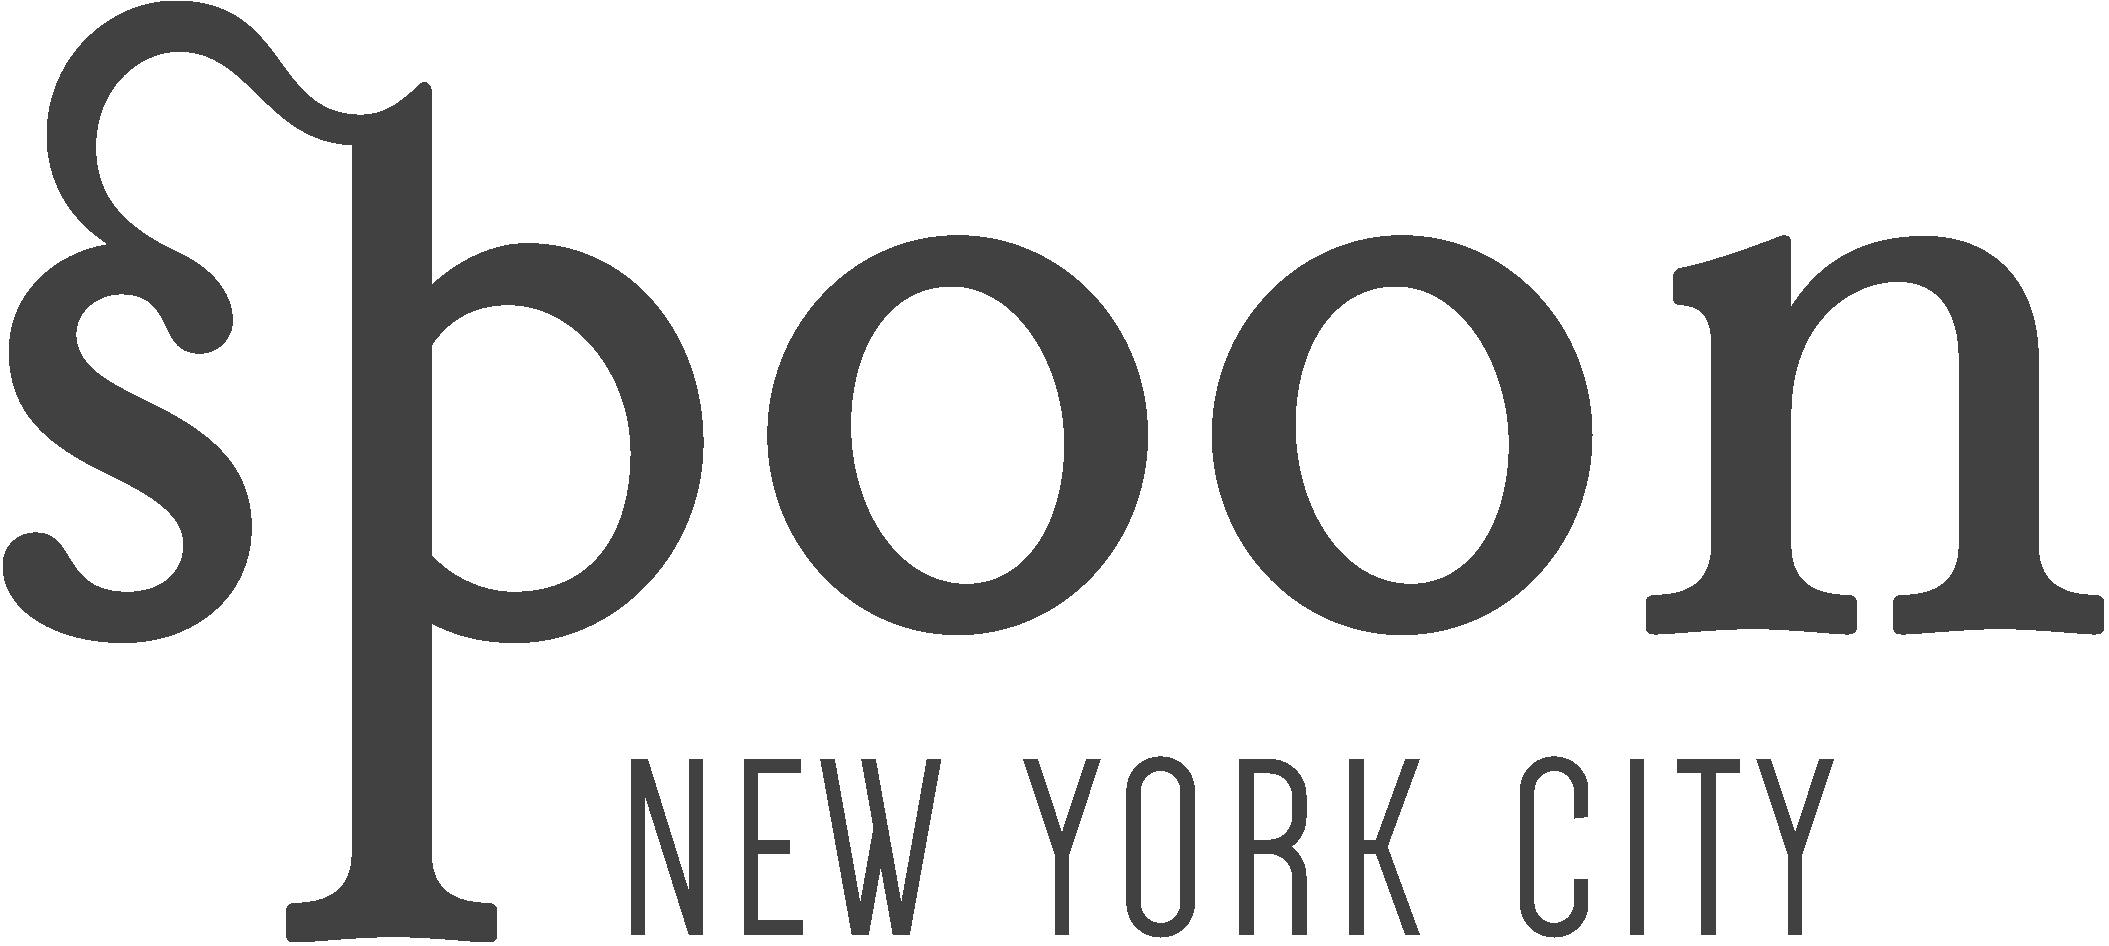 Spoon_logo_transparancy.png